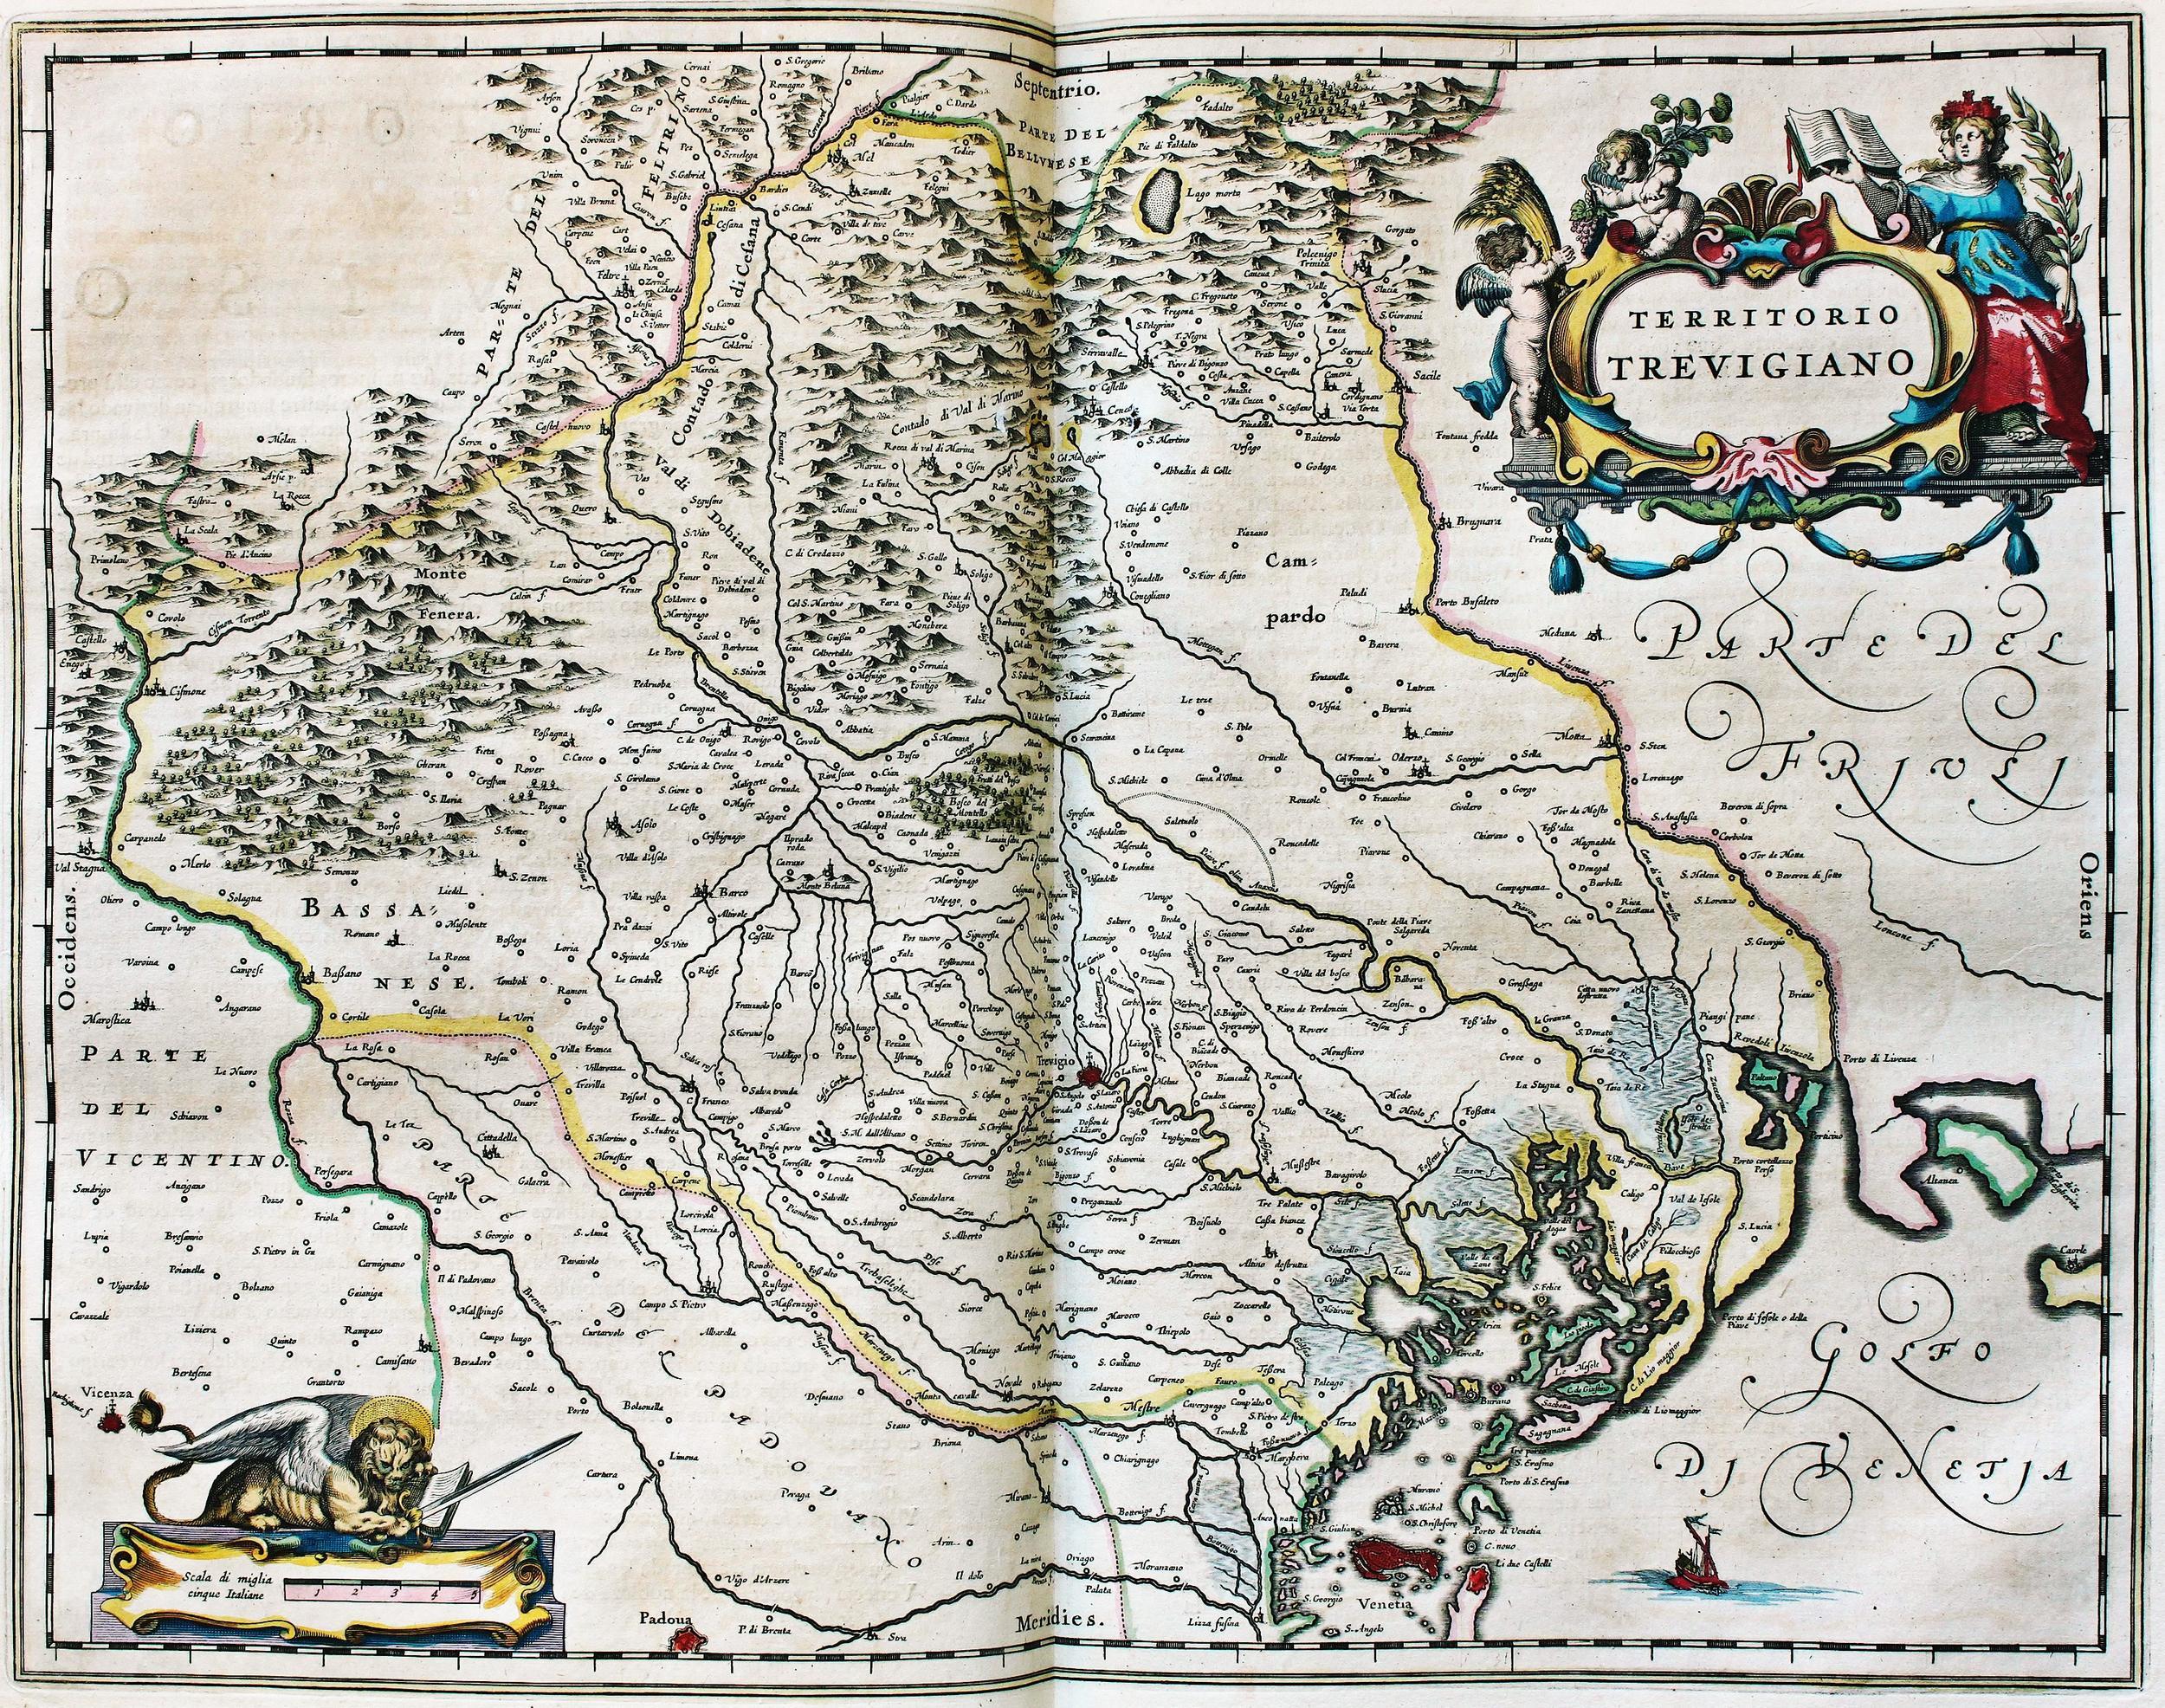 Territorio Trevigiano, opera del cartografo olandese Joan Blaeu.